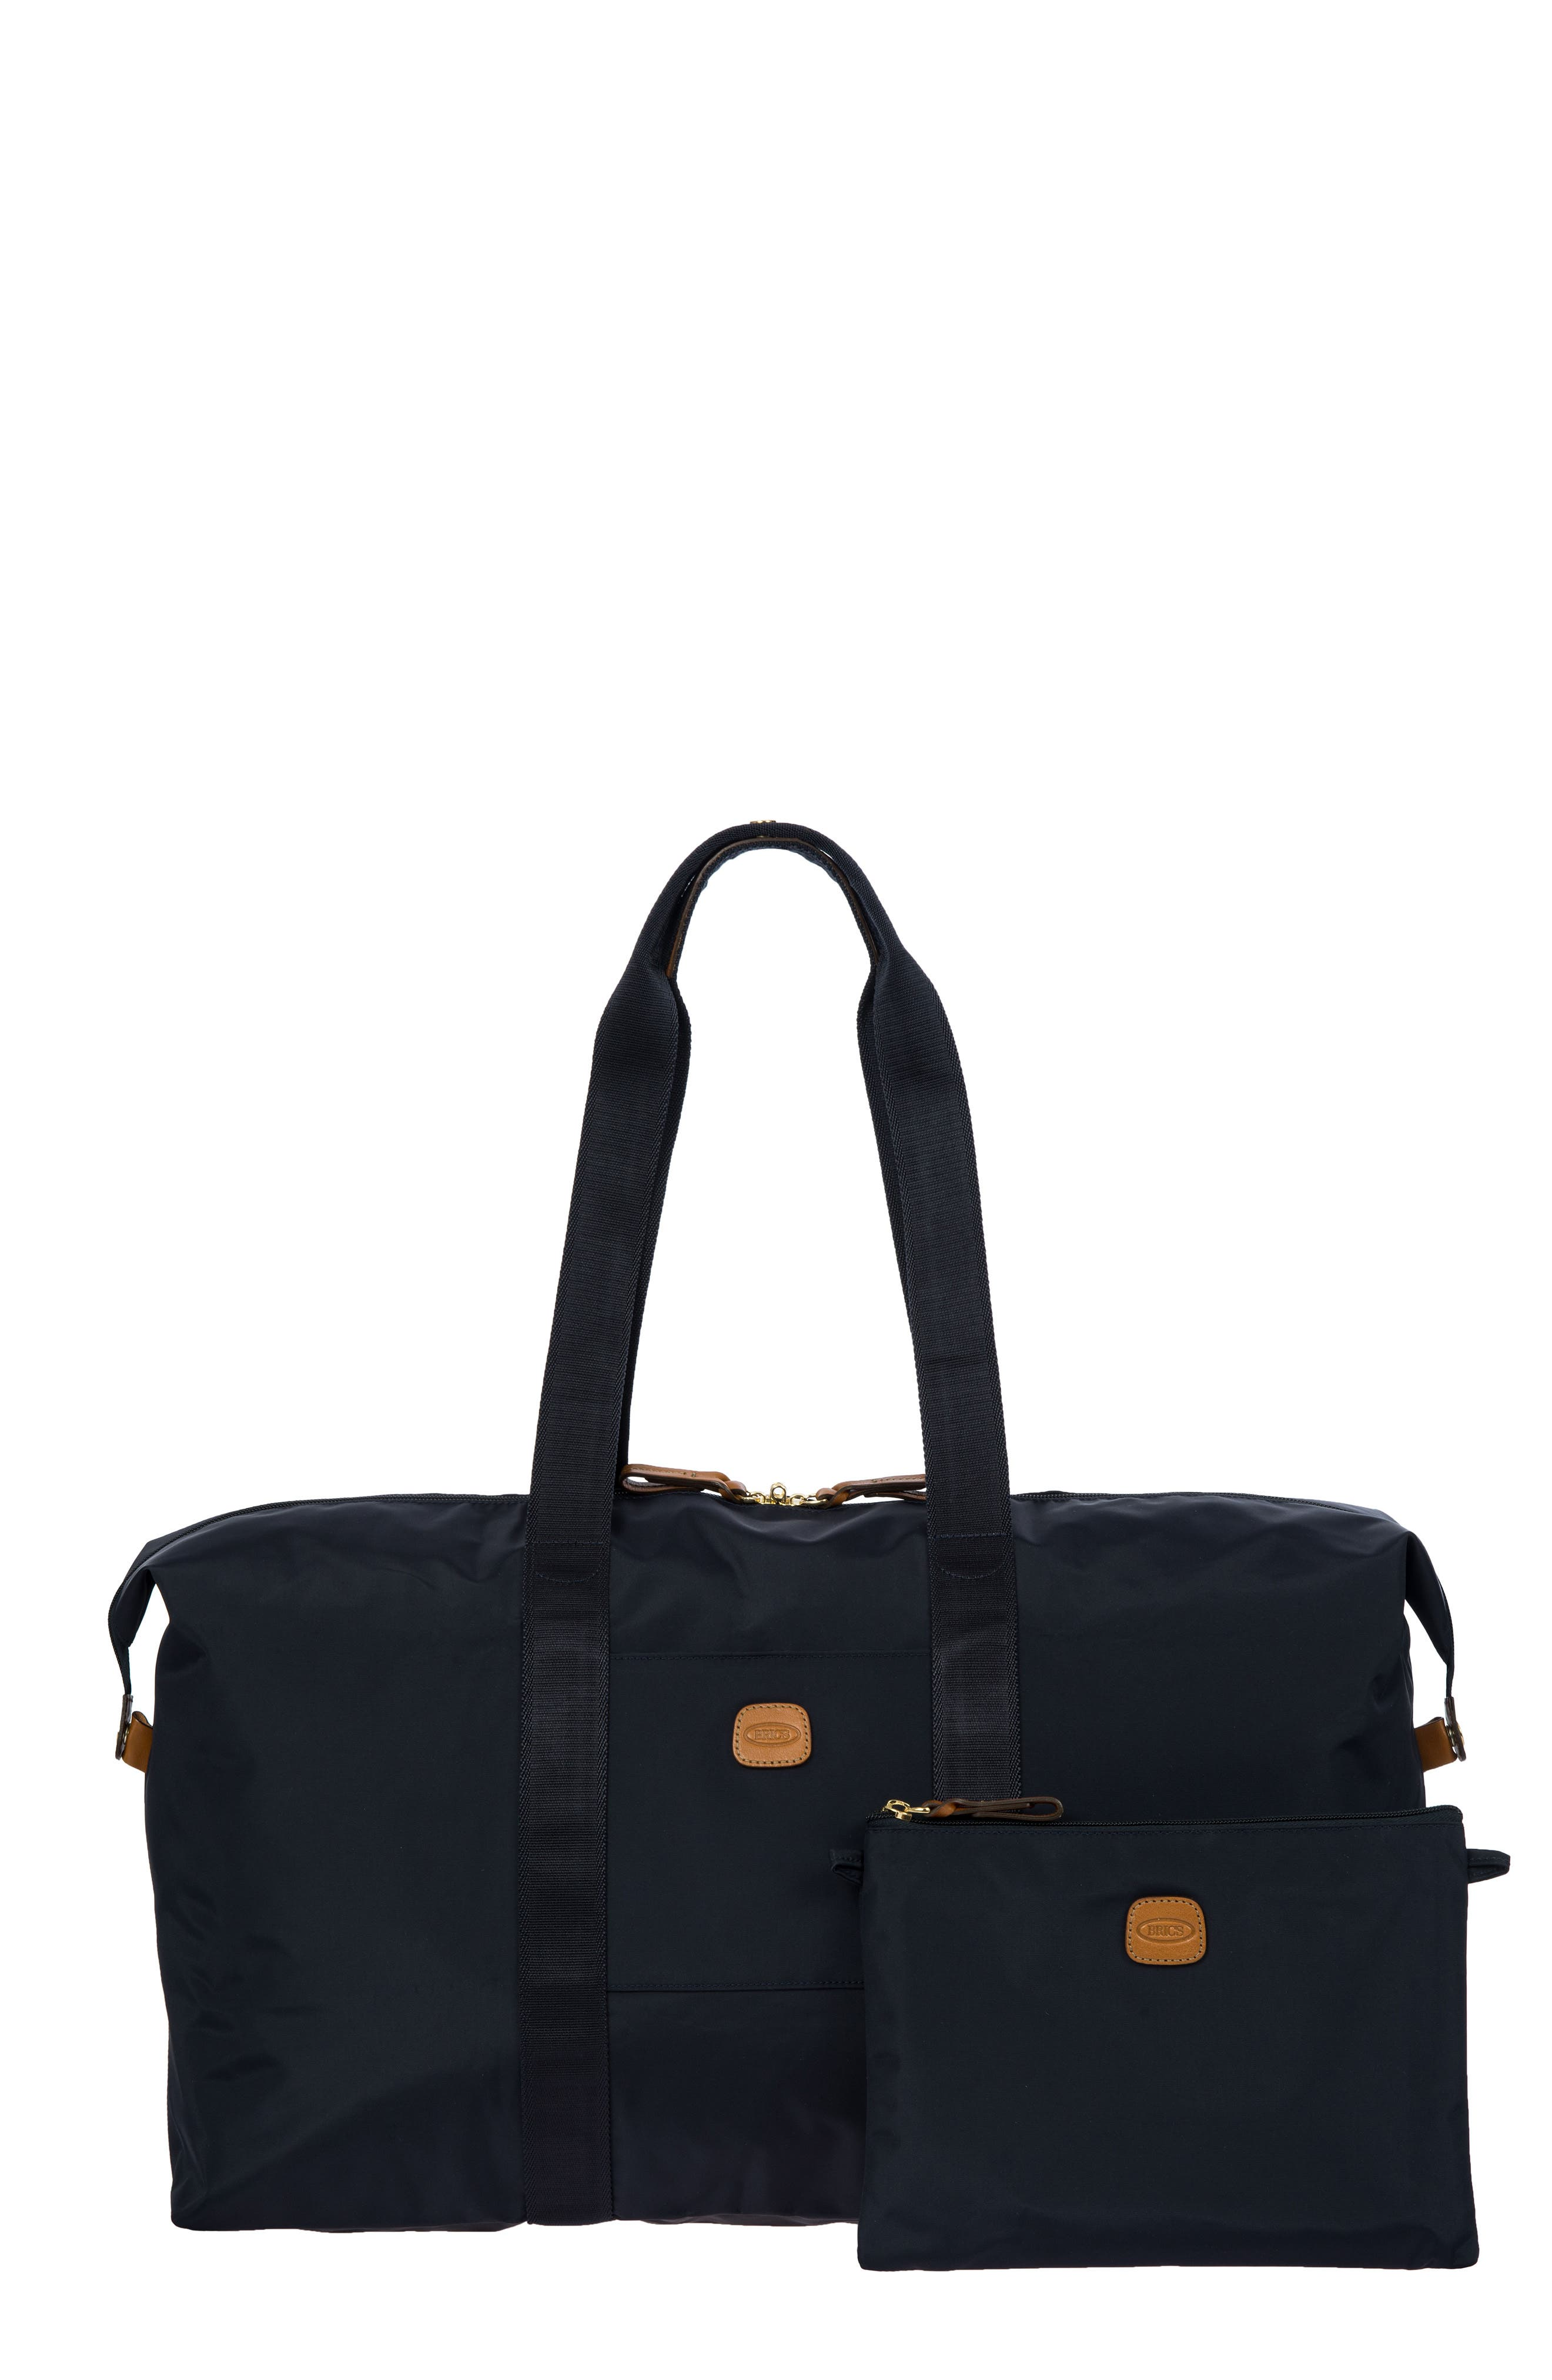 X-Bag 22-Inch Folding Duffel Bag,                             Main thumbnail 1, color,                             NAVY